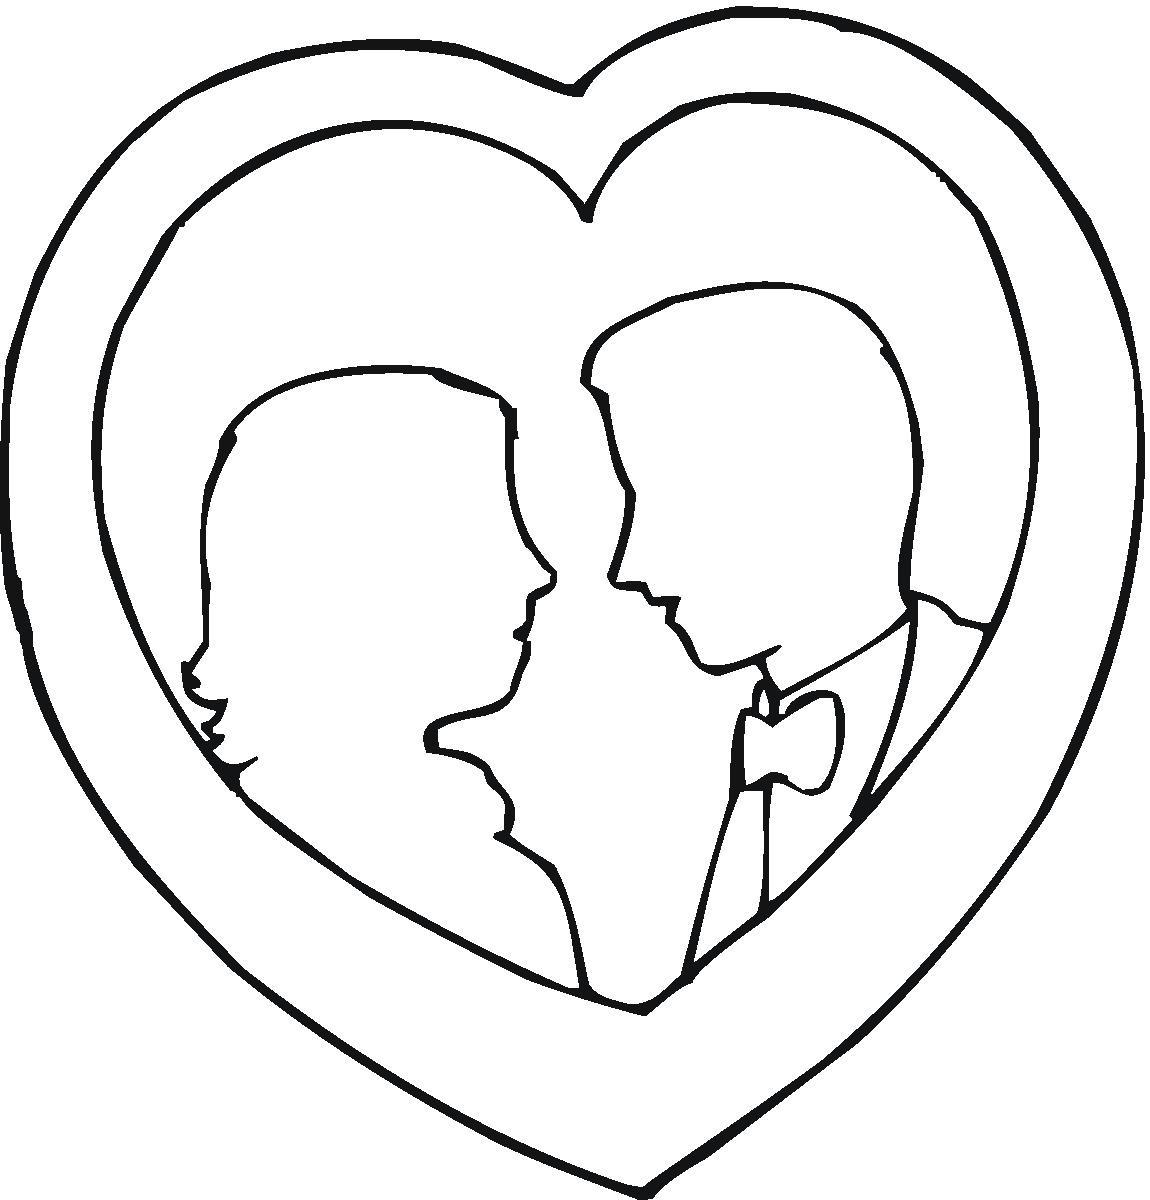 Free Wedding Heart Design Clipart Download Free Clip Art